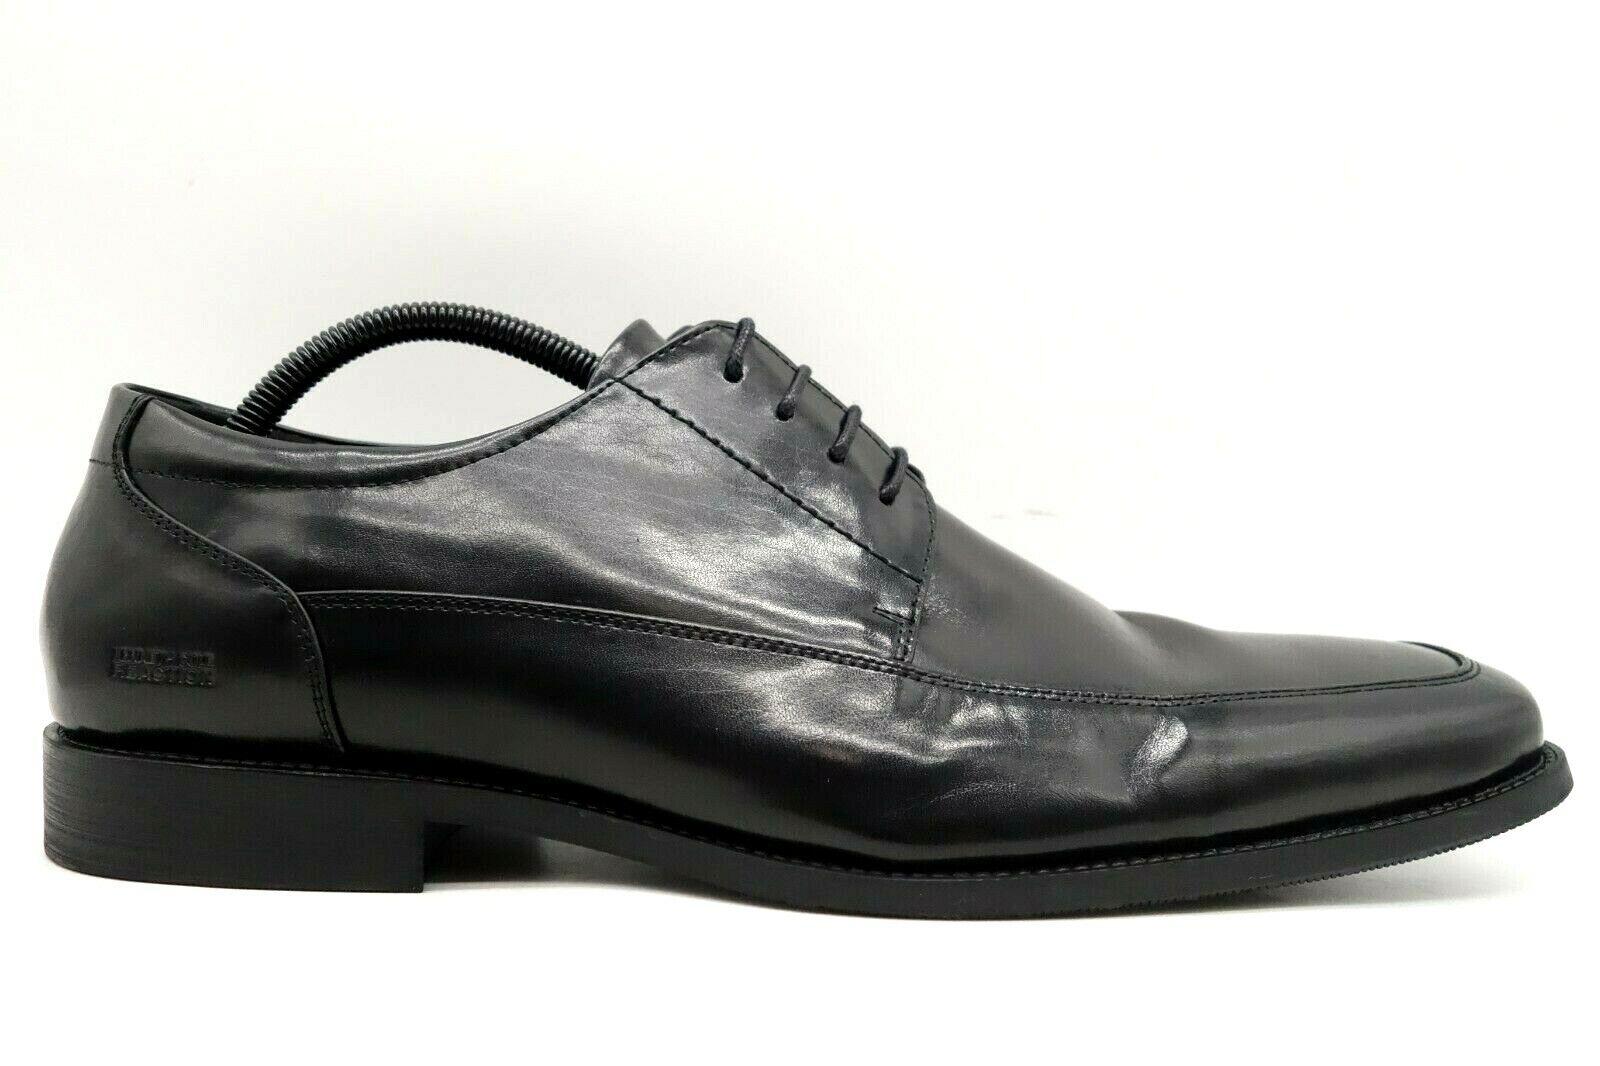 Kenneth Cole Reaction Bottom Line Black Leather Lace Up Oxfords Shoes Men's 12 M